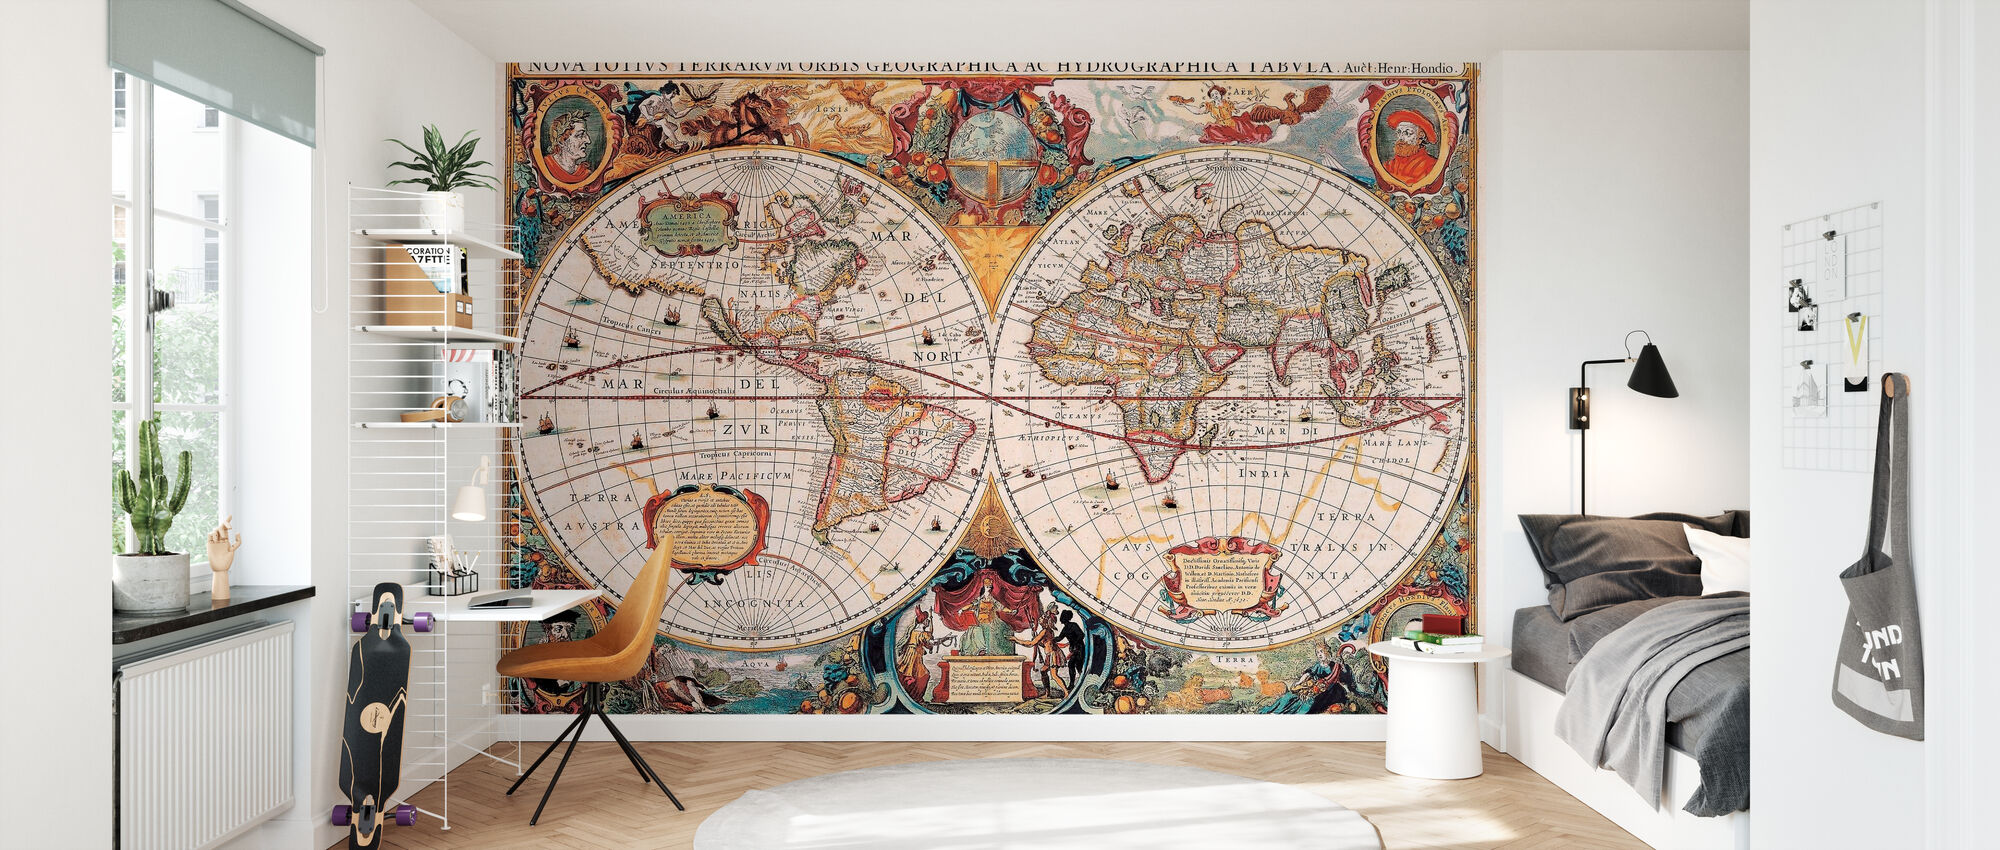 Antique Map - Henricus Hondius 1630 - Wallpaper - Kids Room